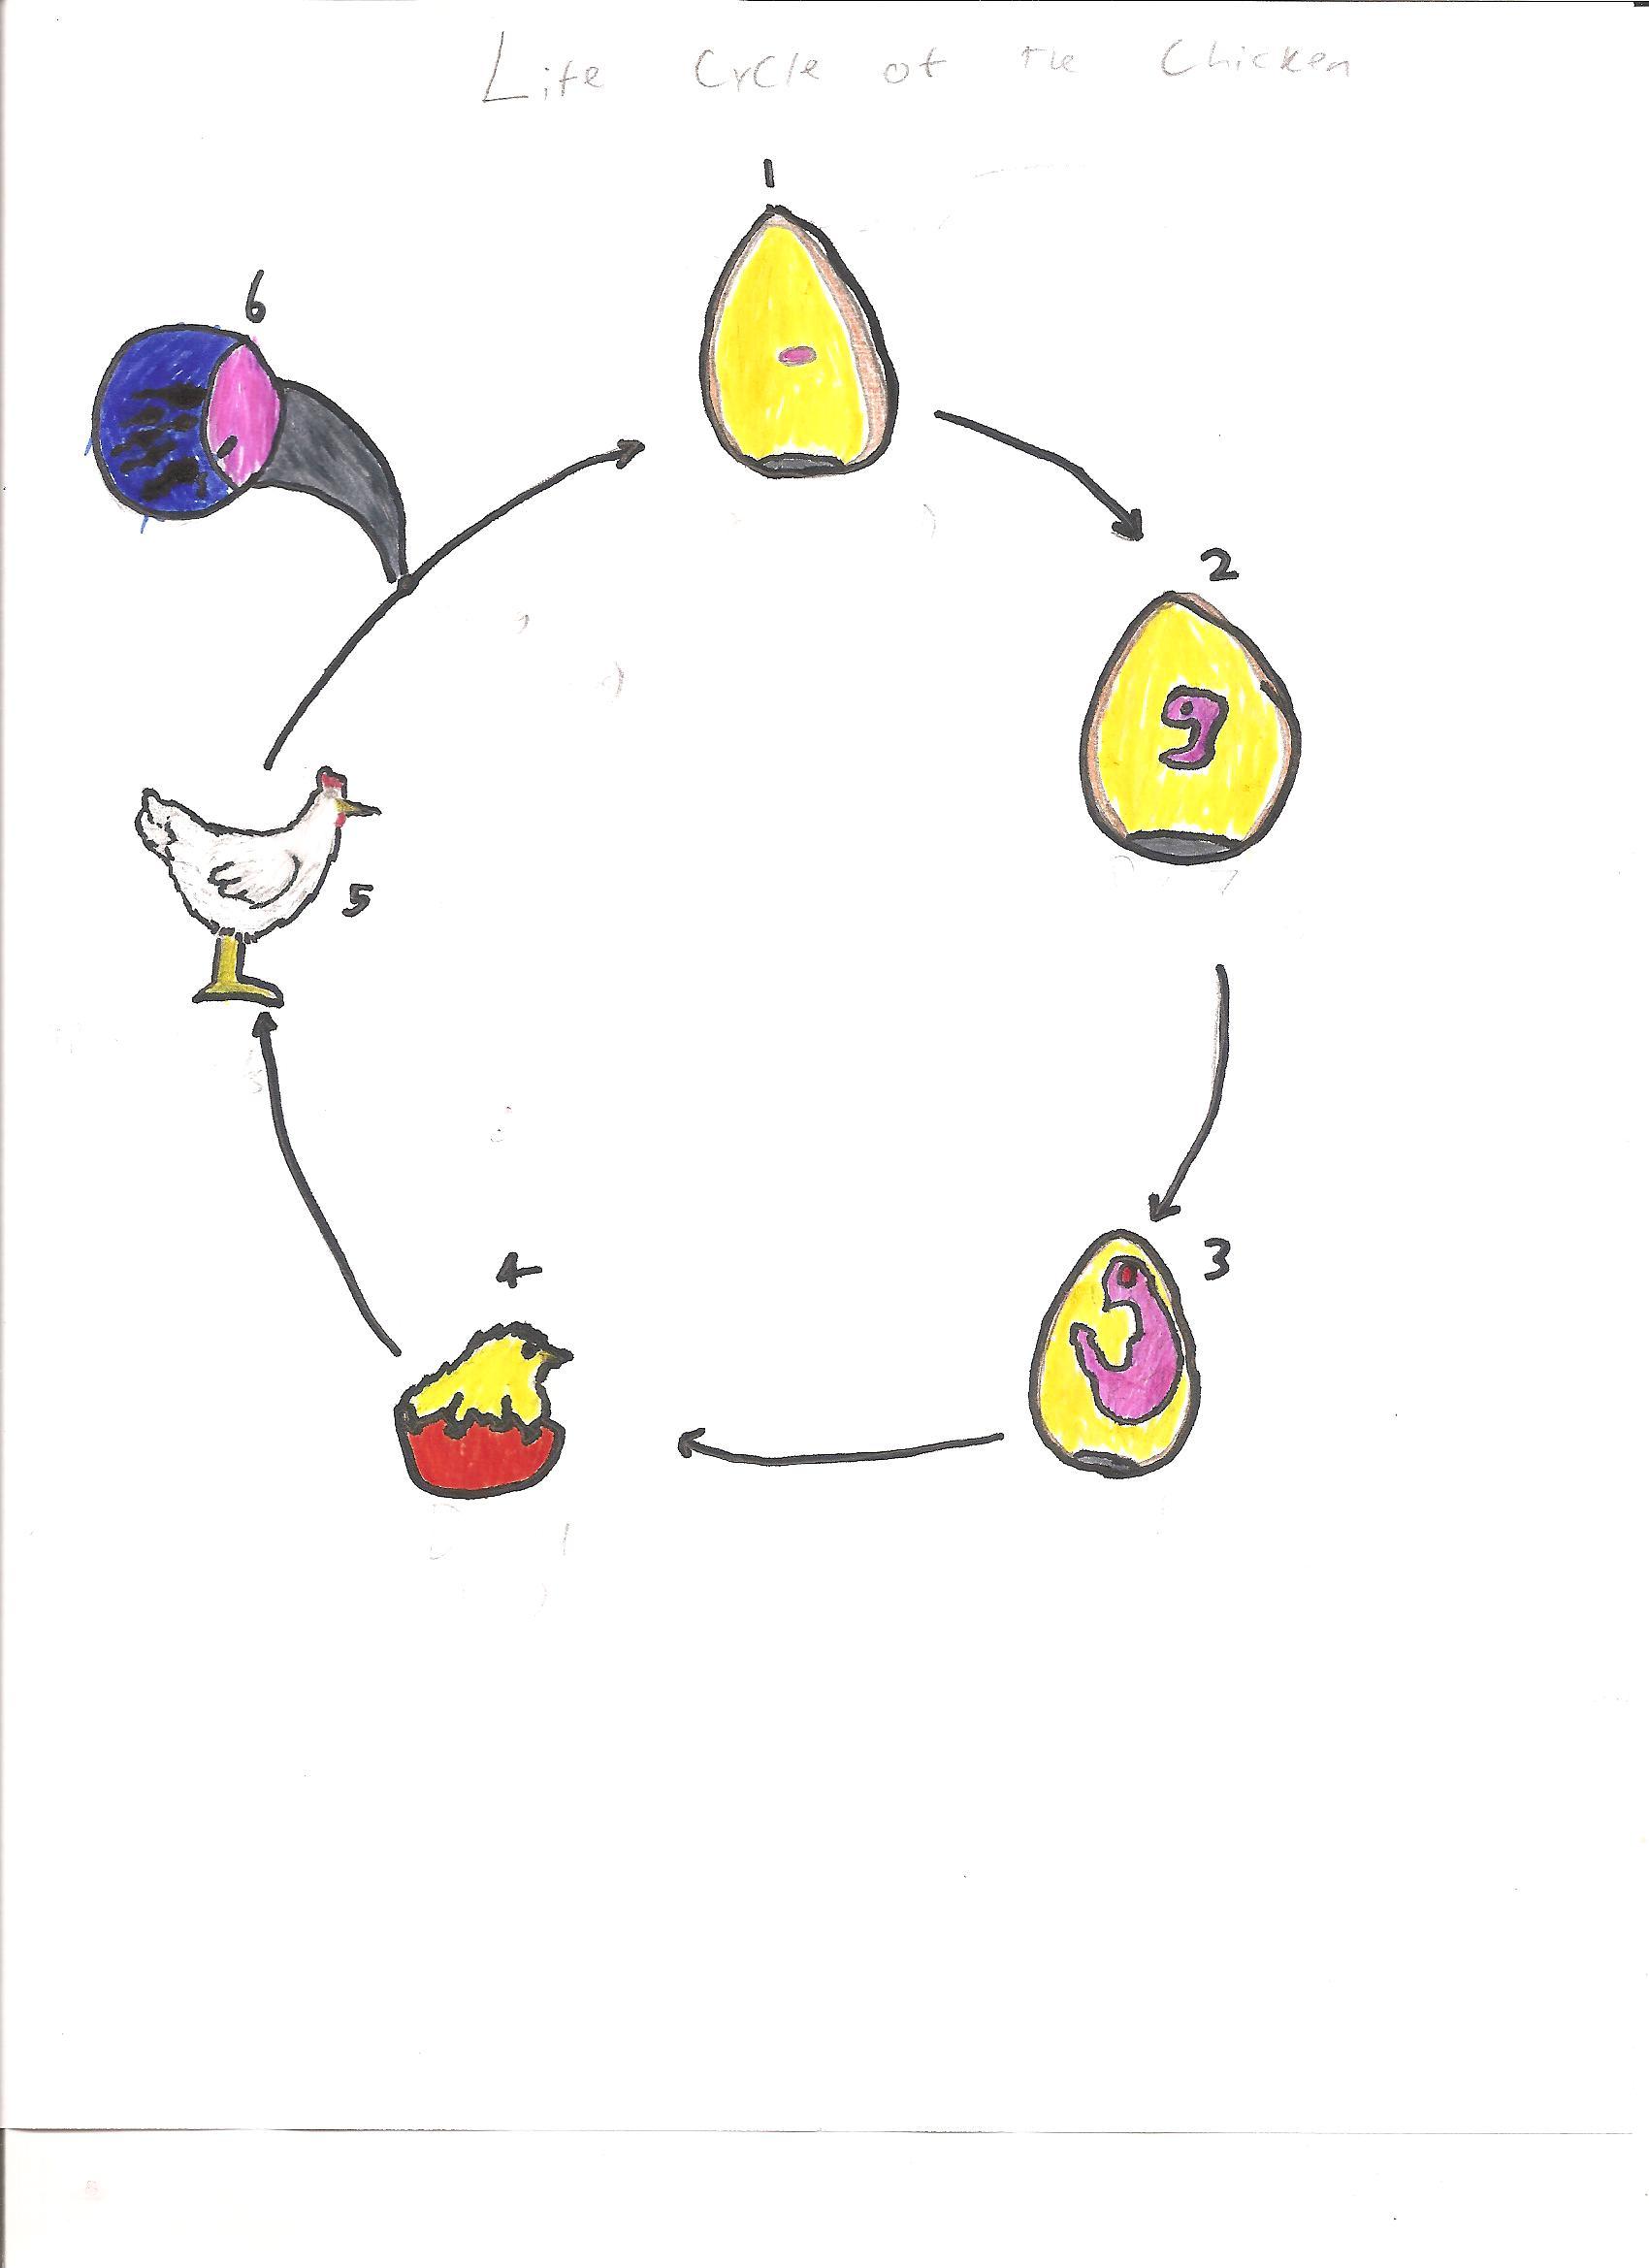 Life cycle of a chicken life cycle of a chicken photo11 robcynllc Choice Image